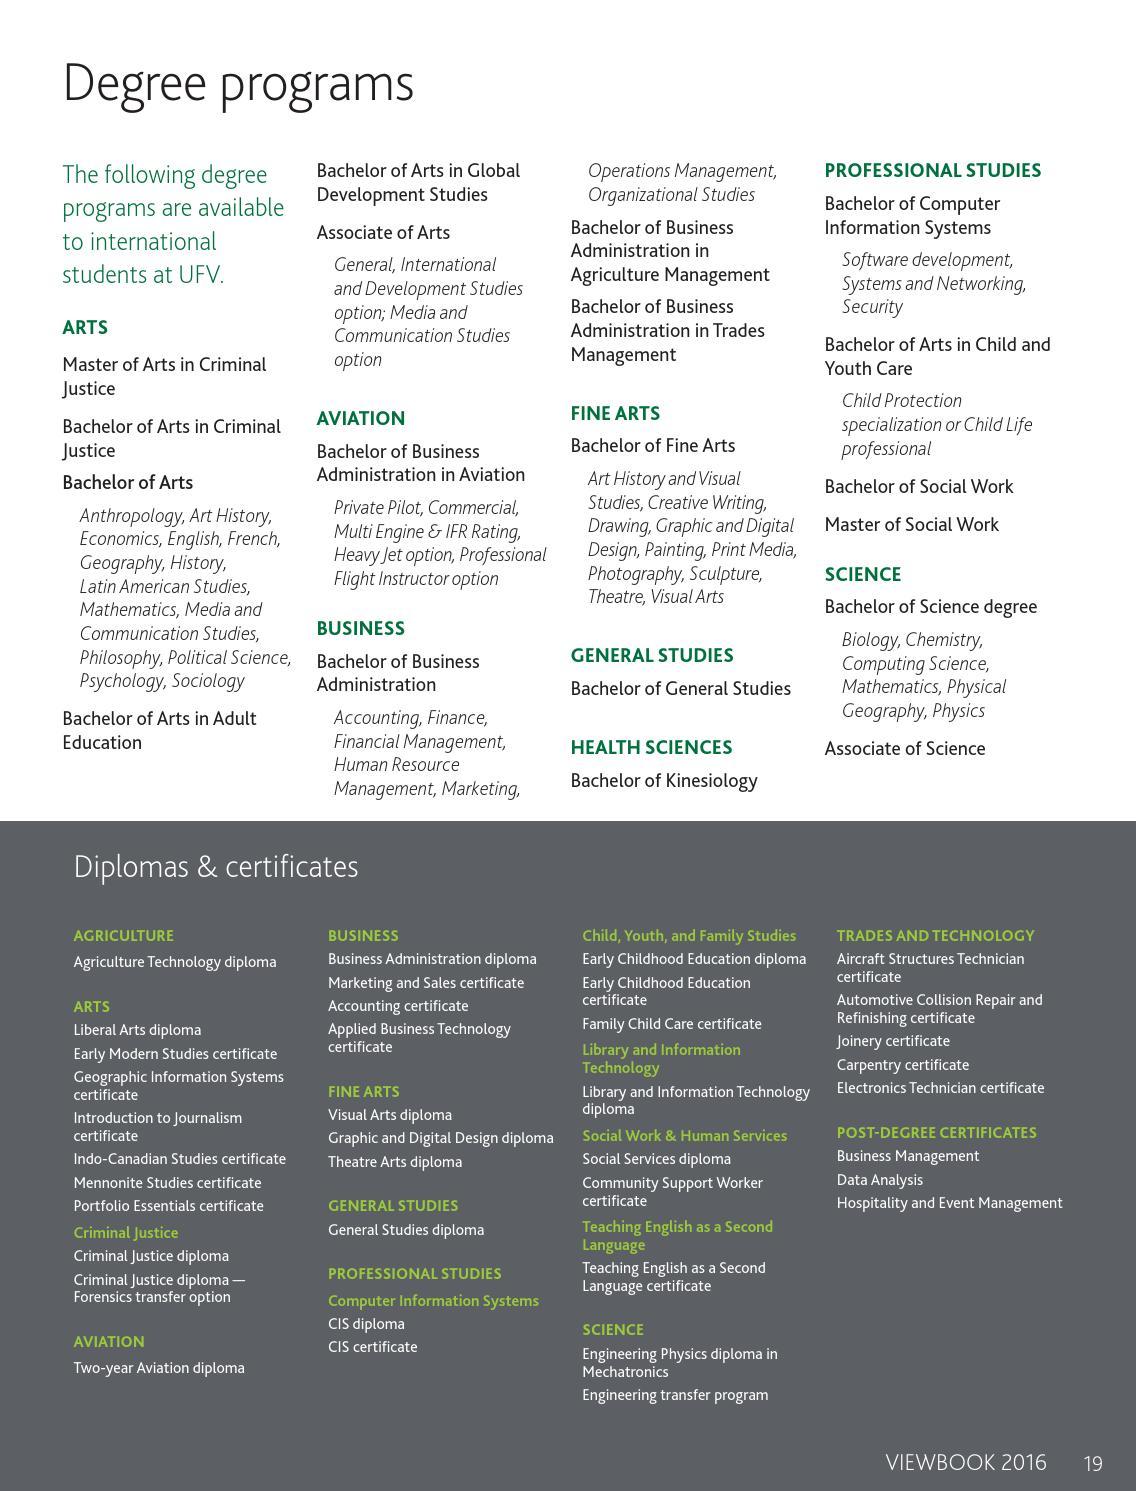 Ufv international viewbook 2015 by university of the fraser valley ufv international viewbook 2015 by university of the fraser valley issuu xflitez Images